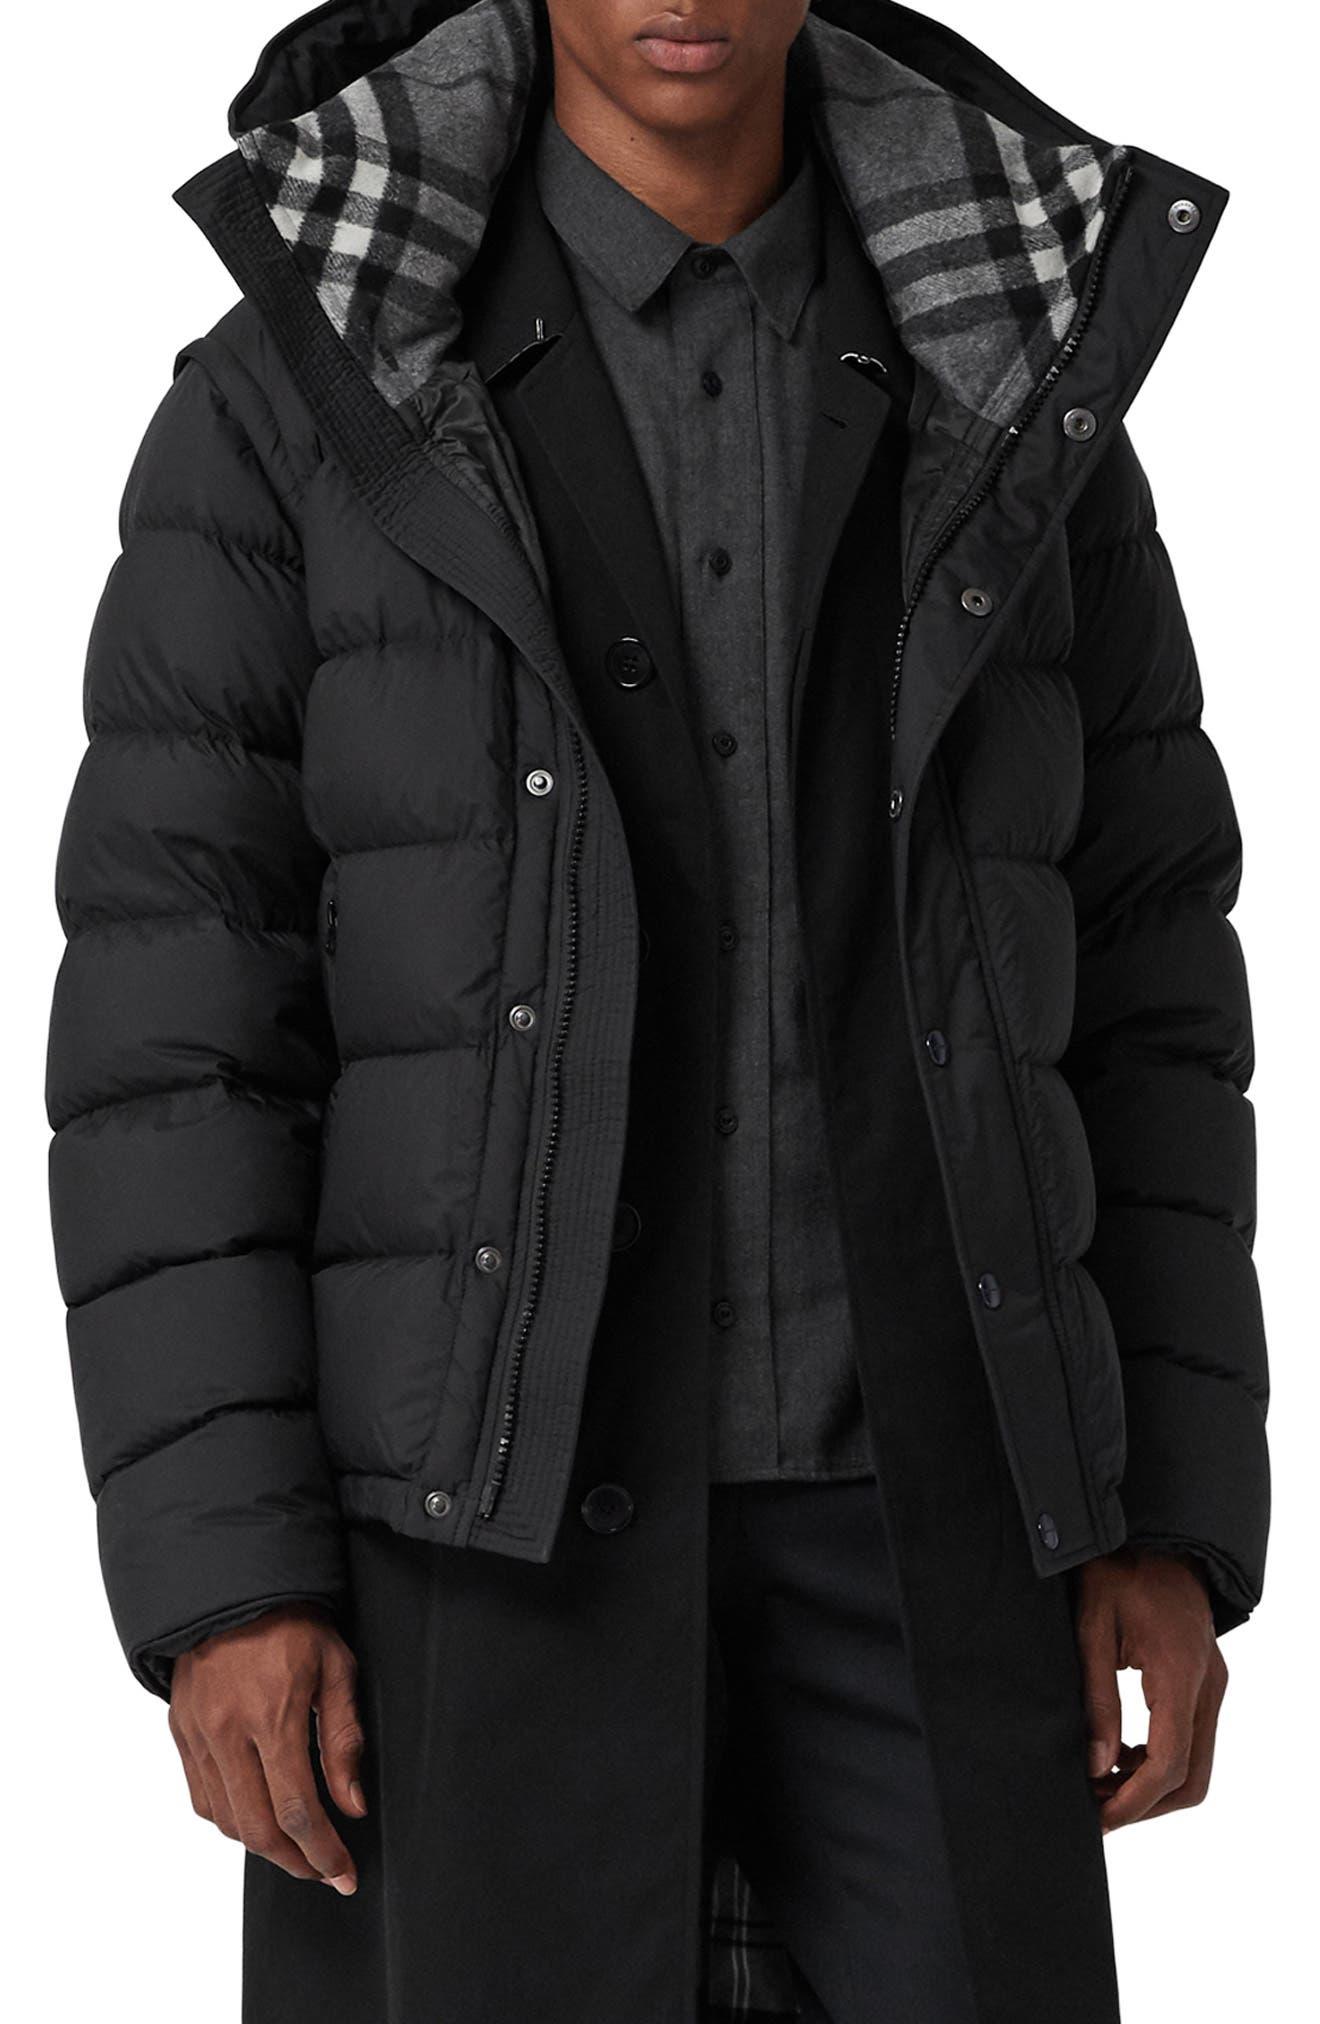 Hartley Hybrid Jacket with Detachable Sleeves,                             Main thumbnail 1, color,                             001